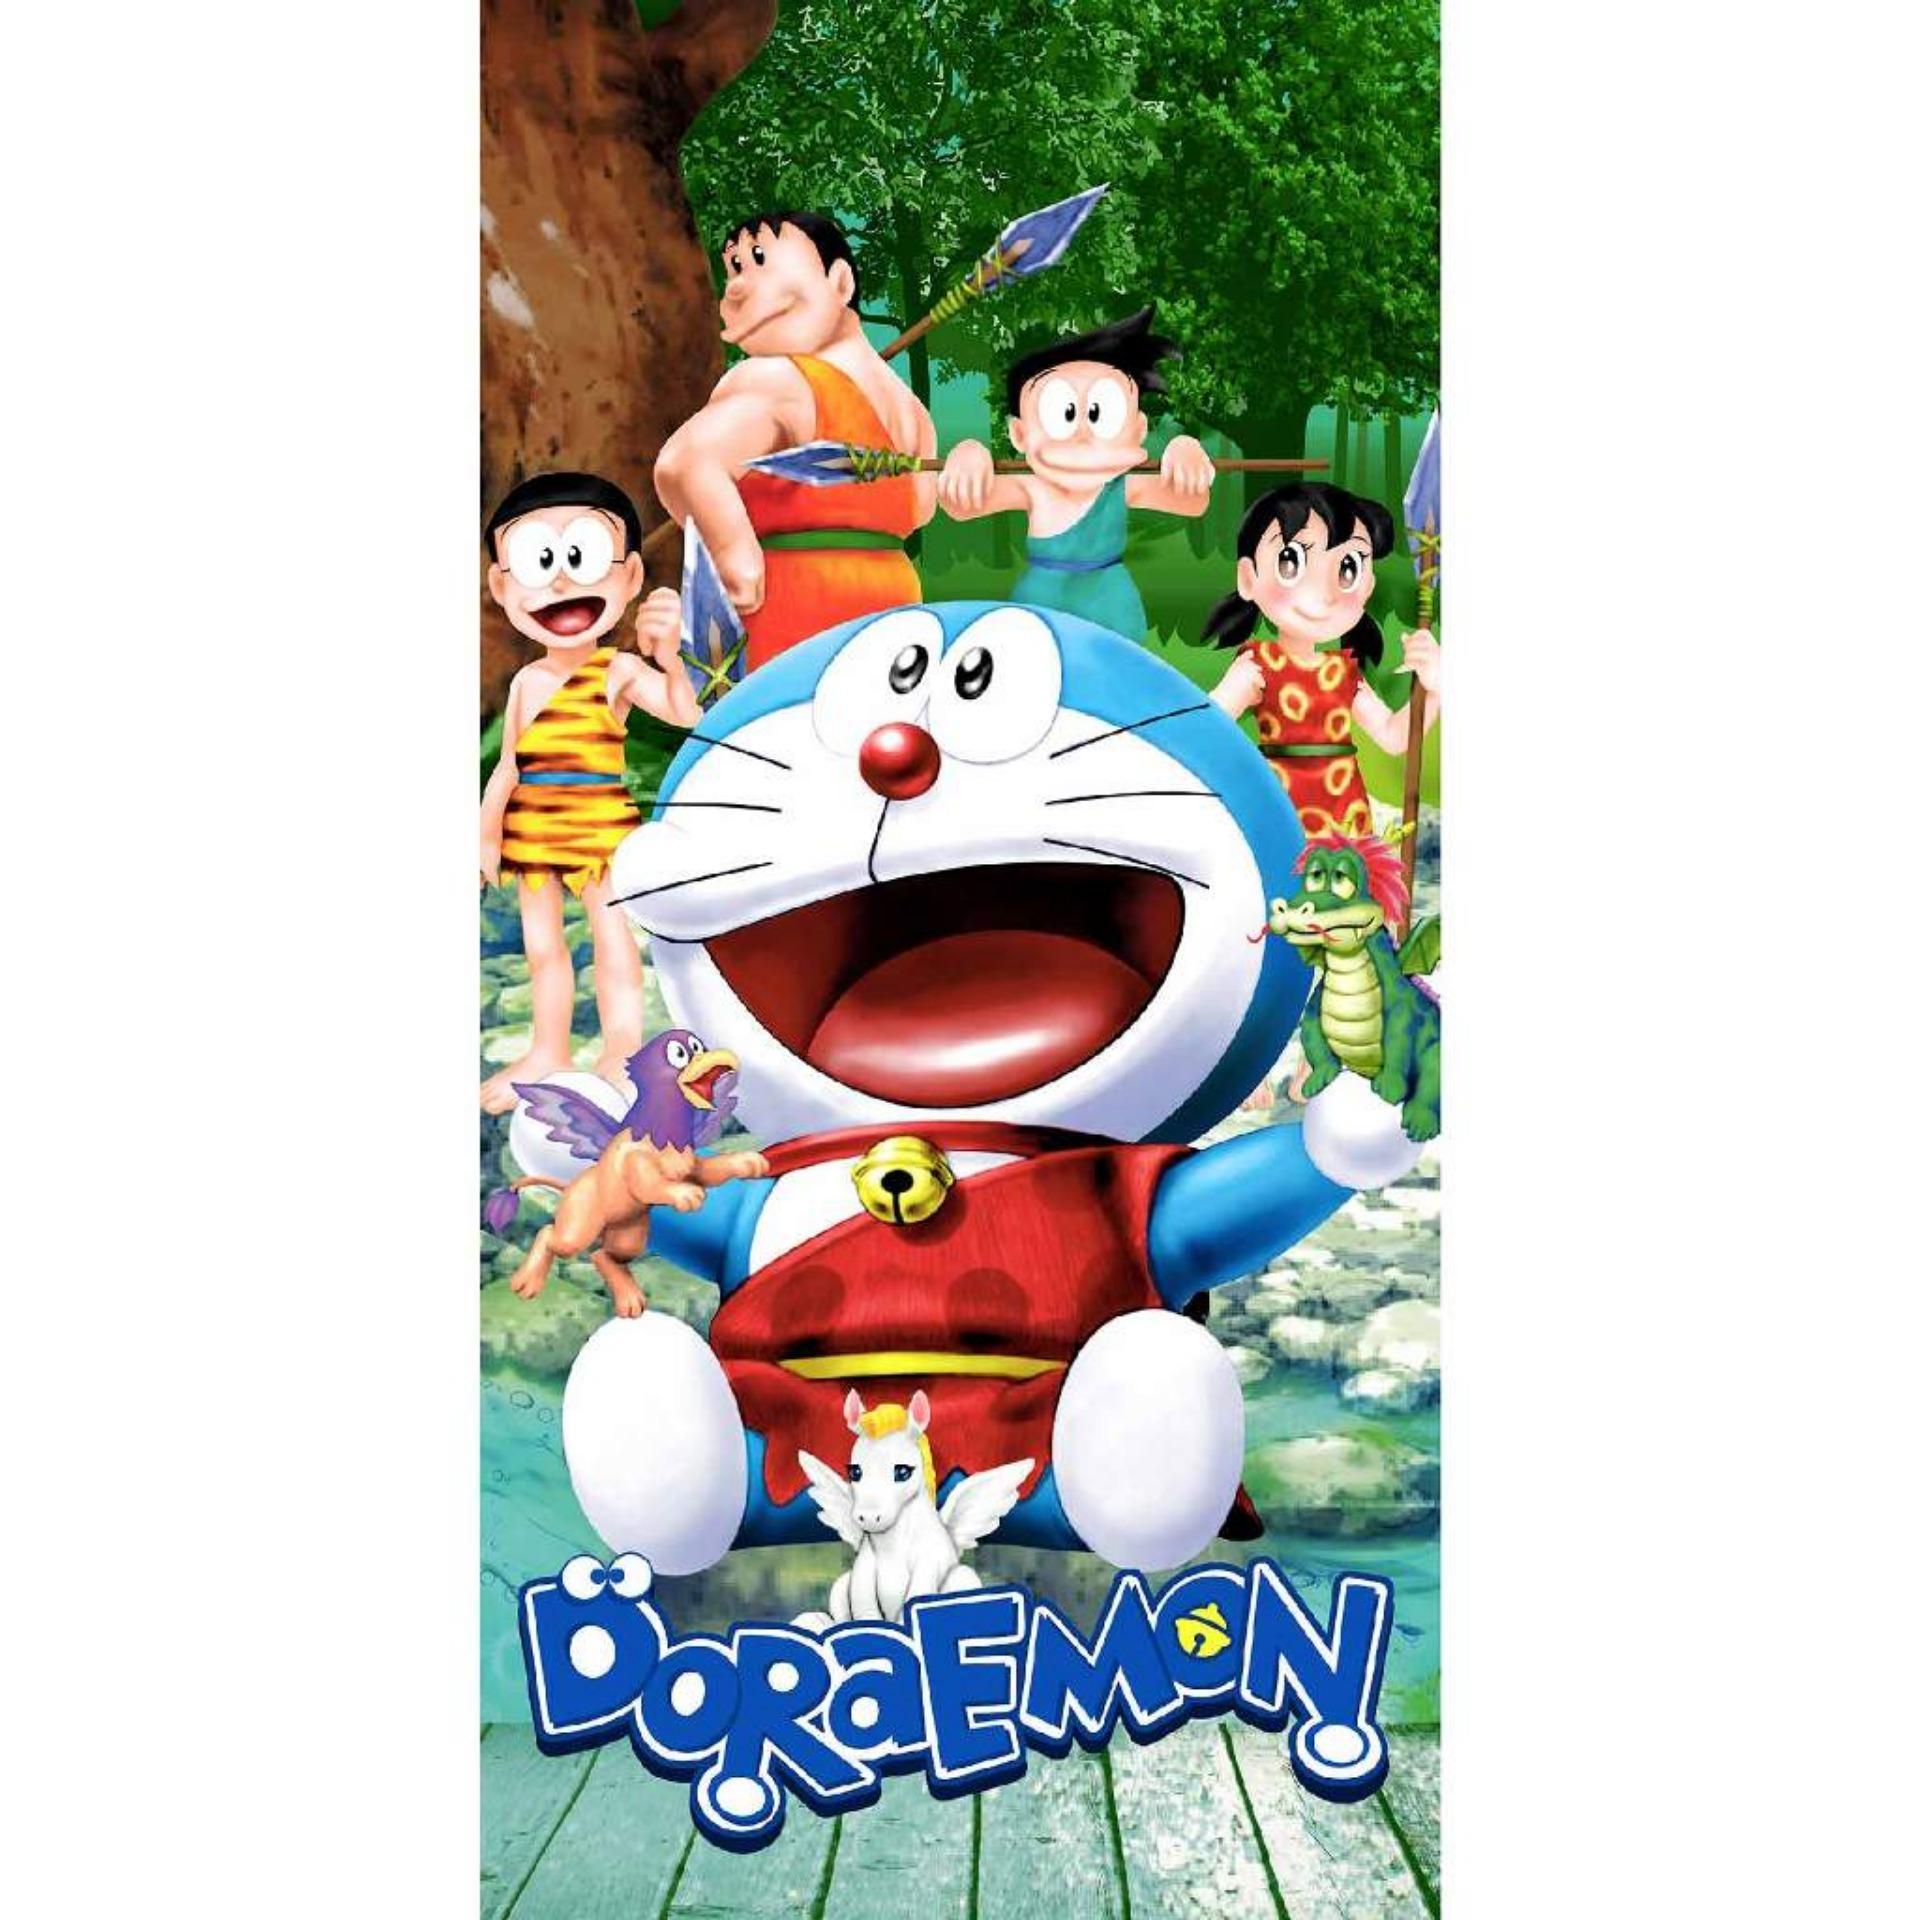 Buy Sell Cheapest Goplm Bath Towel Best Quality Product Deals Handuk Pamela Jumbo By Lenuta Rosanna Printing Panel 50x100cm Doraemon